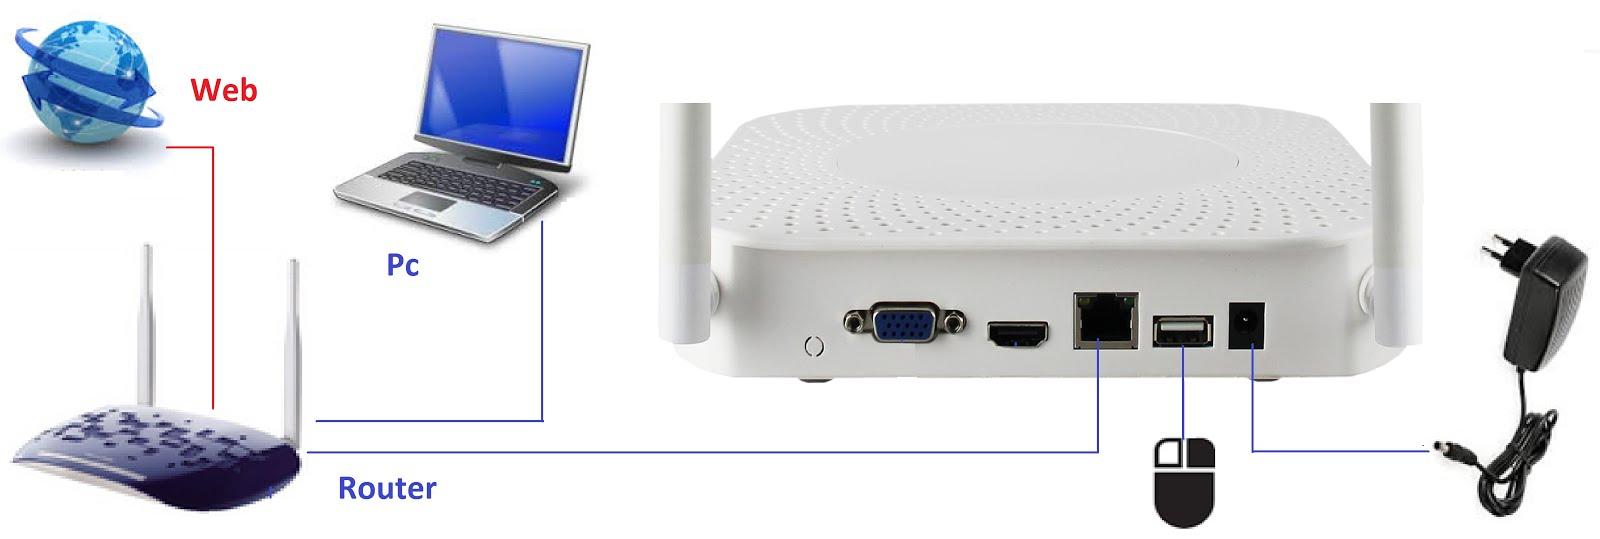 Schema Collegamento Nvr : Isnatch infohelp isnatch kit per videosorveglianza wifi nvr